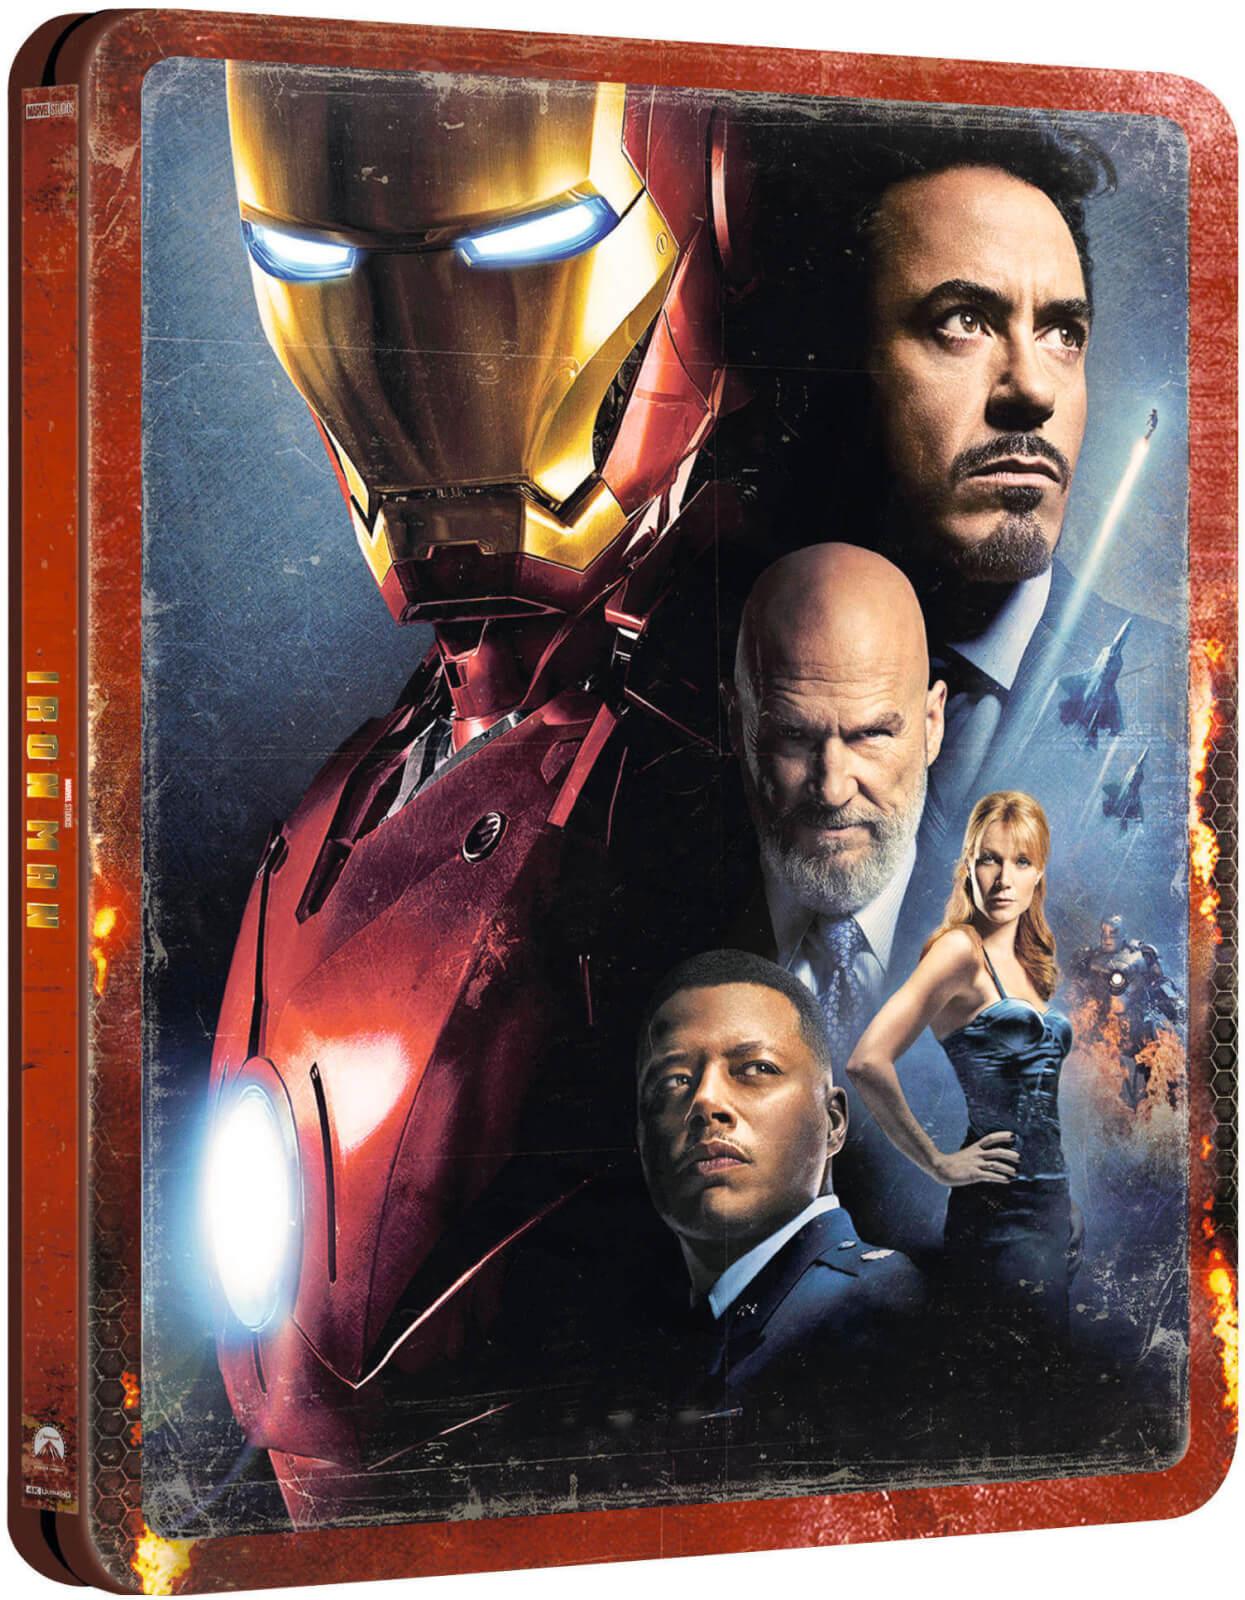 Steelbook Exclusif Iron Man - 4K Ultra HD (Blu-ray 2D inclus)